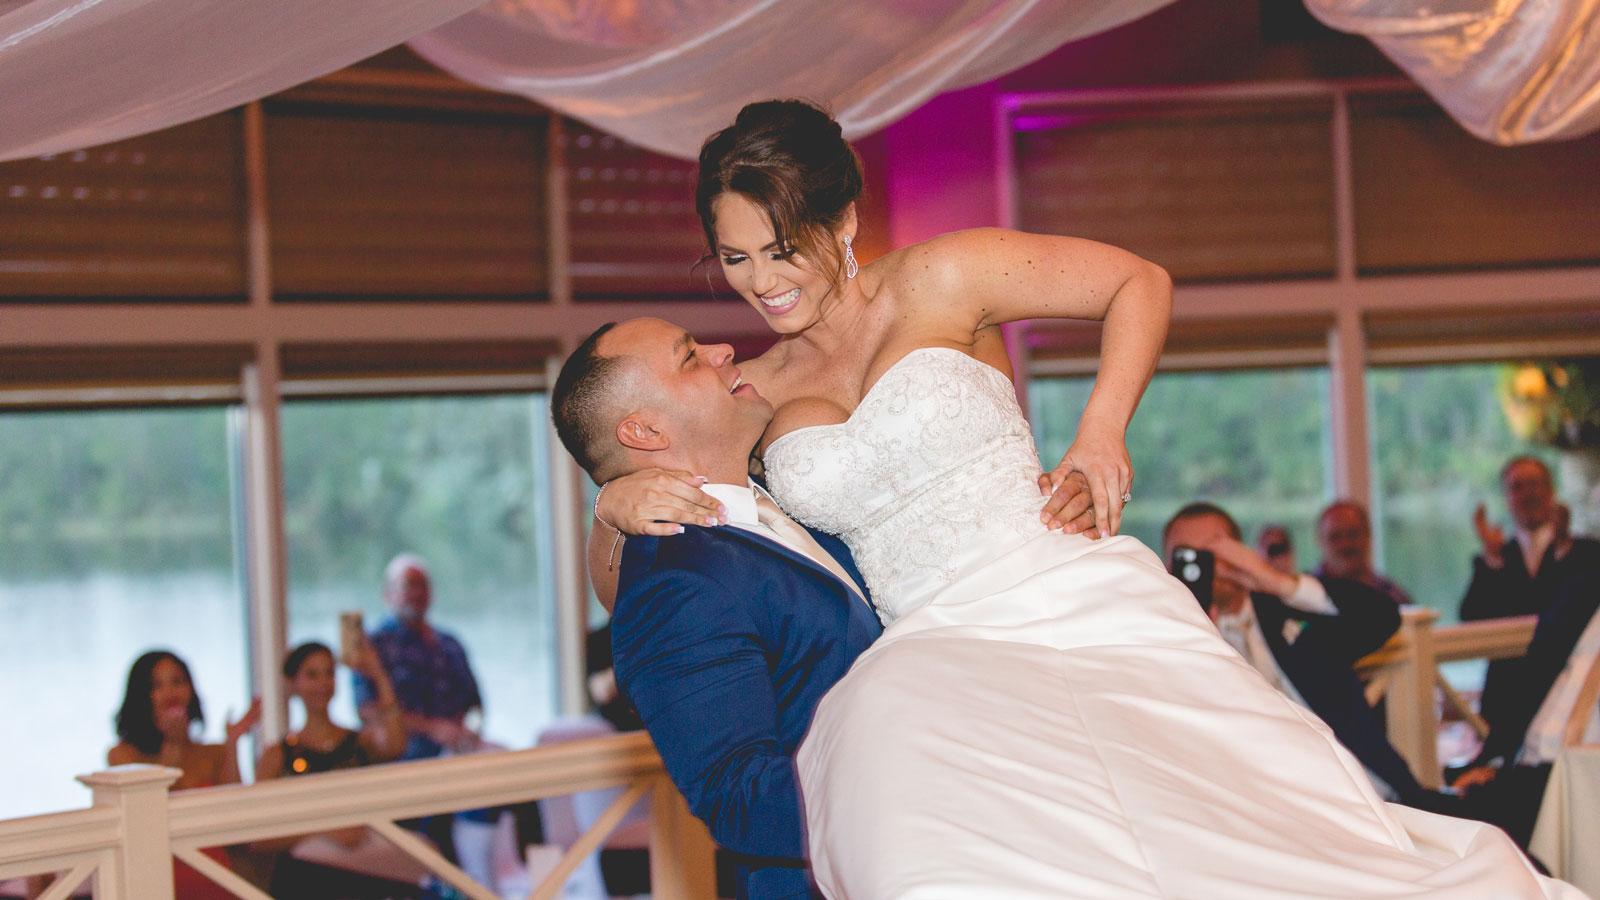 BradmasterJ Wedding Services